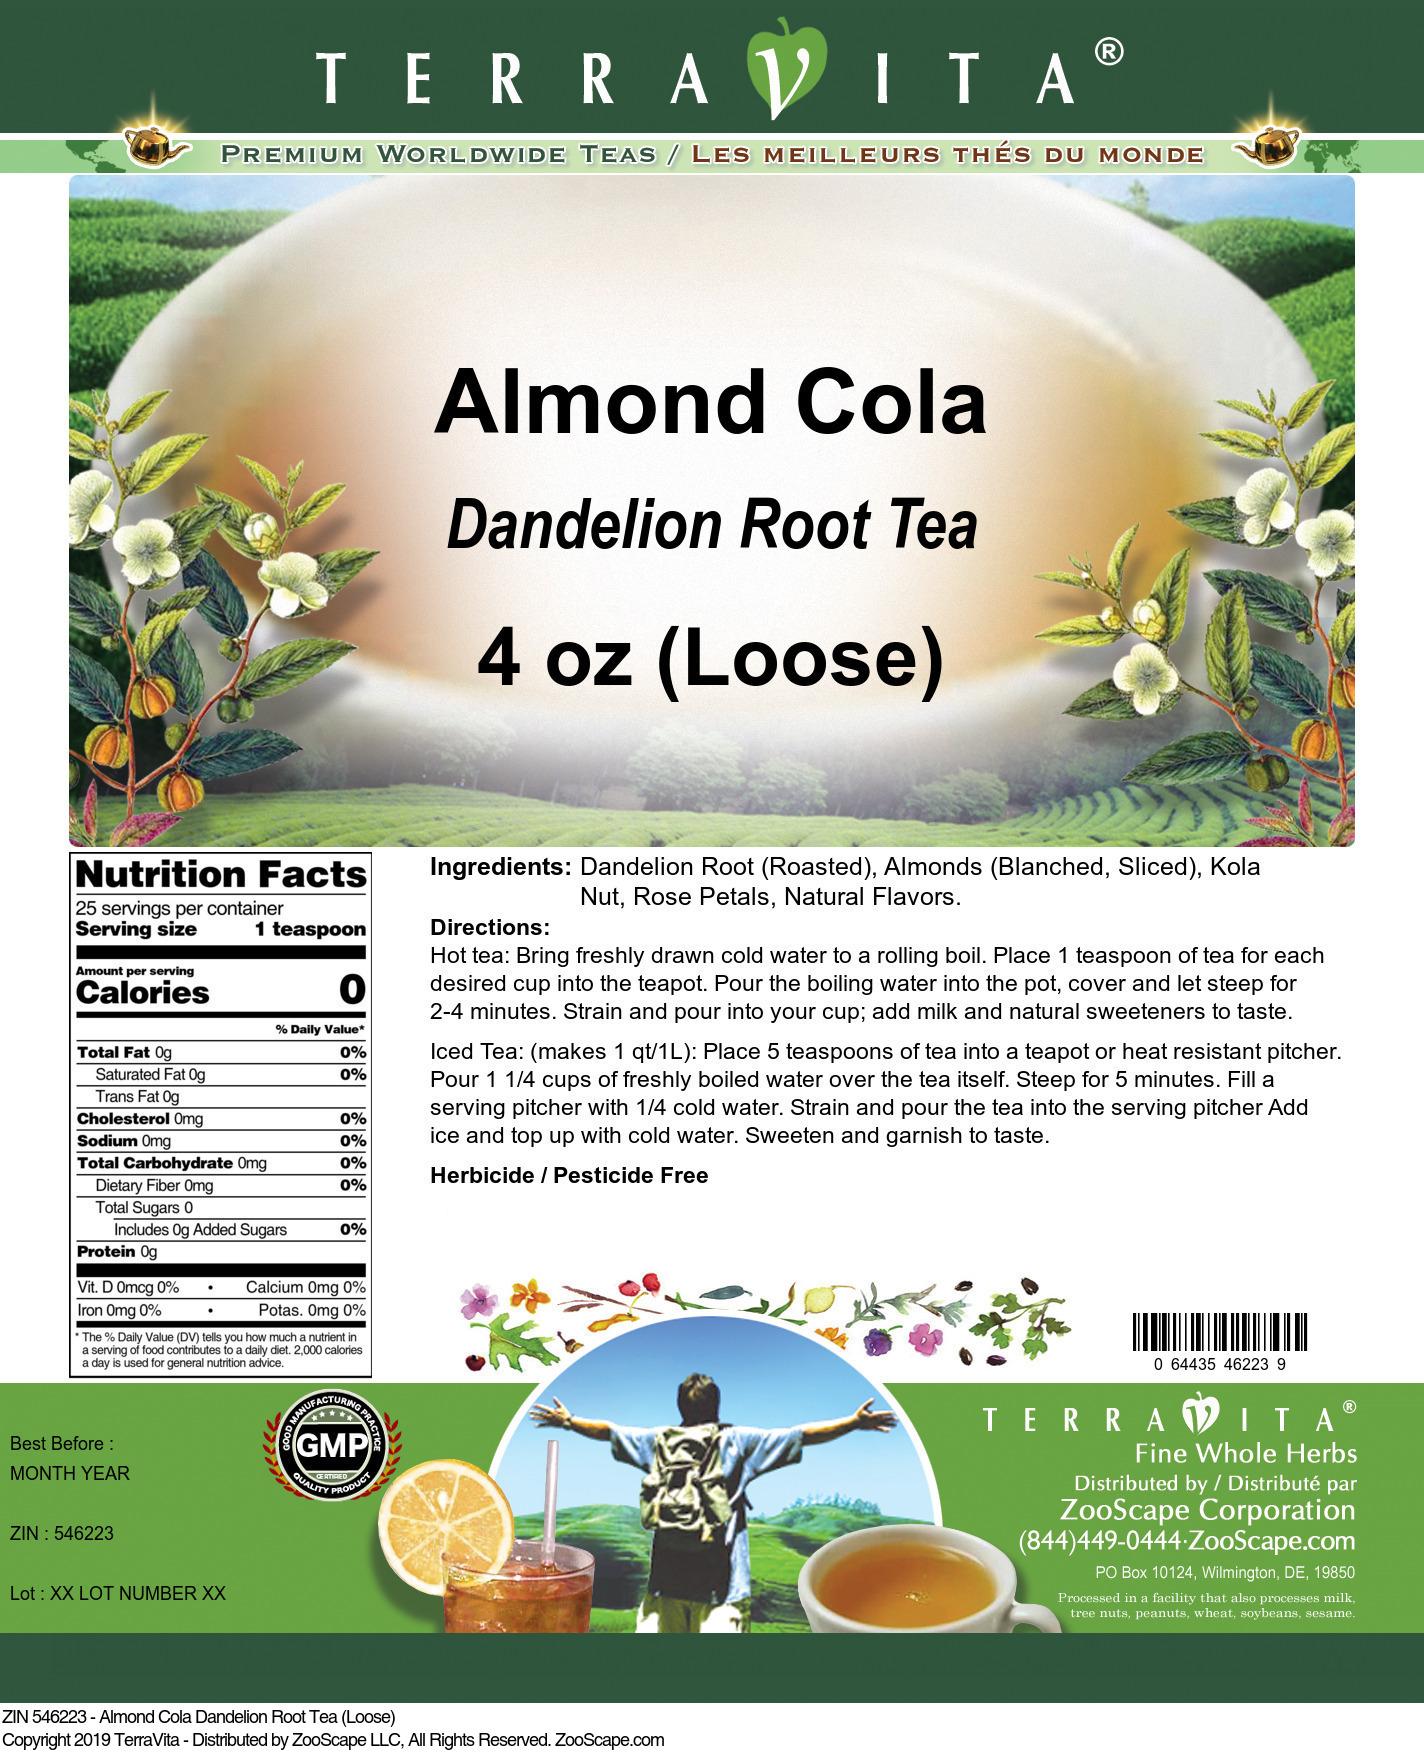 Almond Cola Dandelion Root